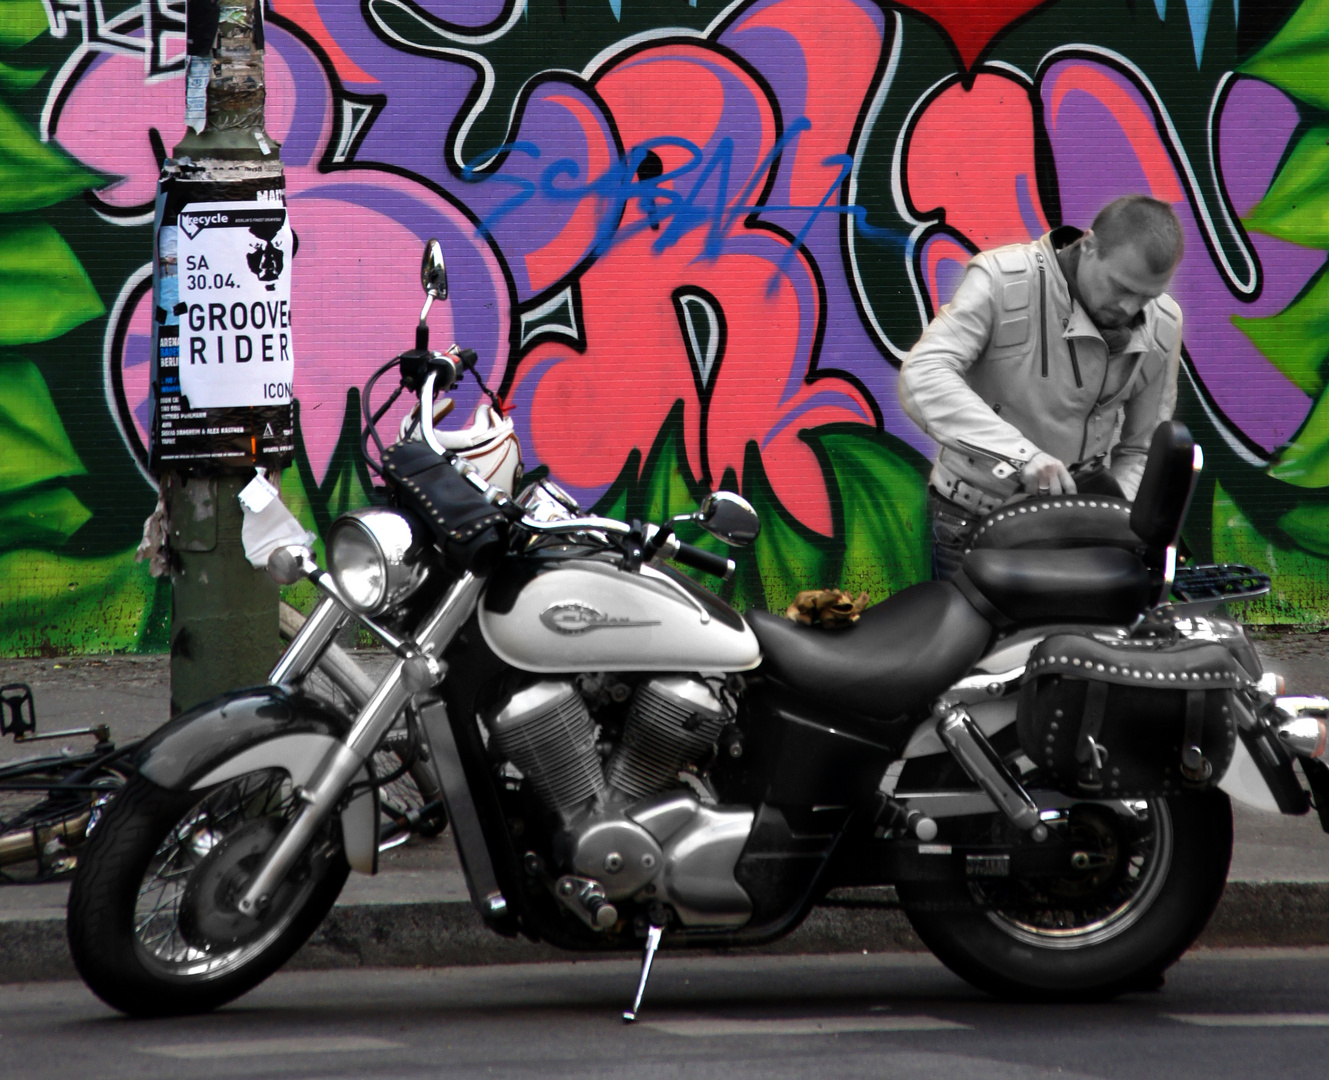 Groove Rider